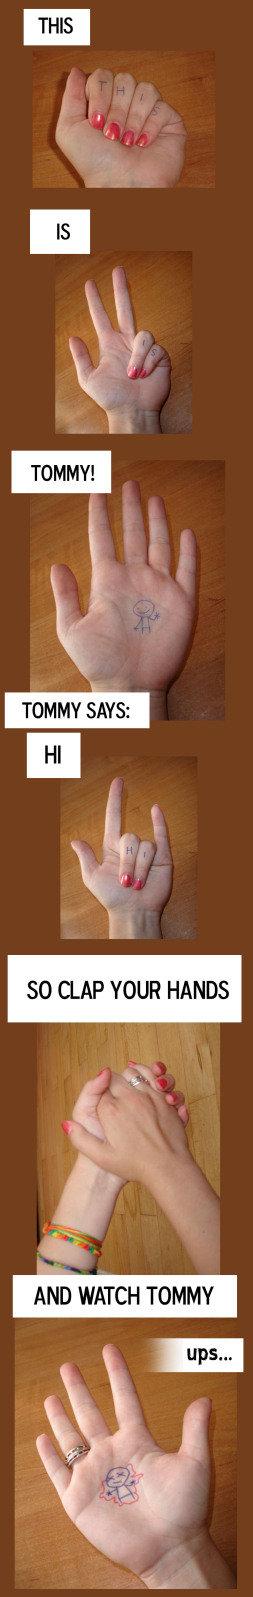 He says hi. say hi. THE TOMMY!